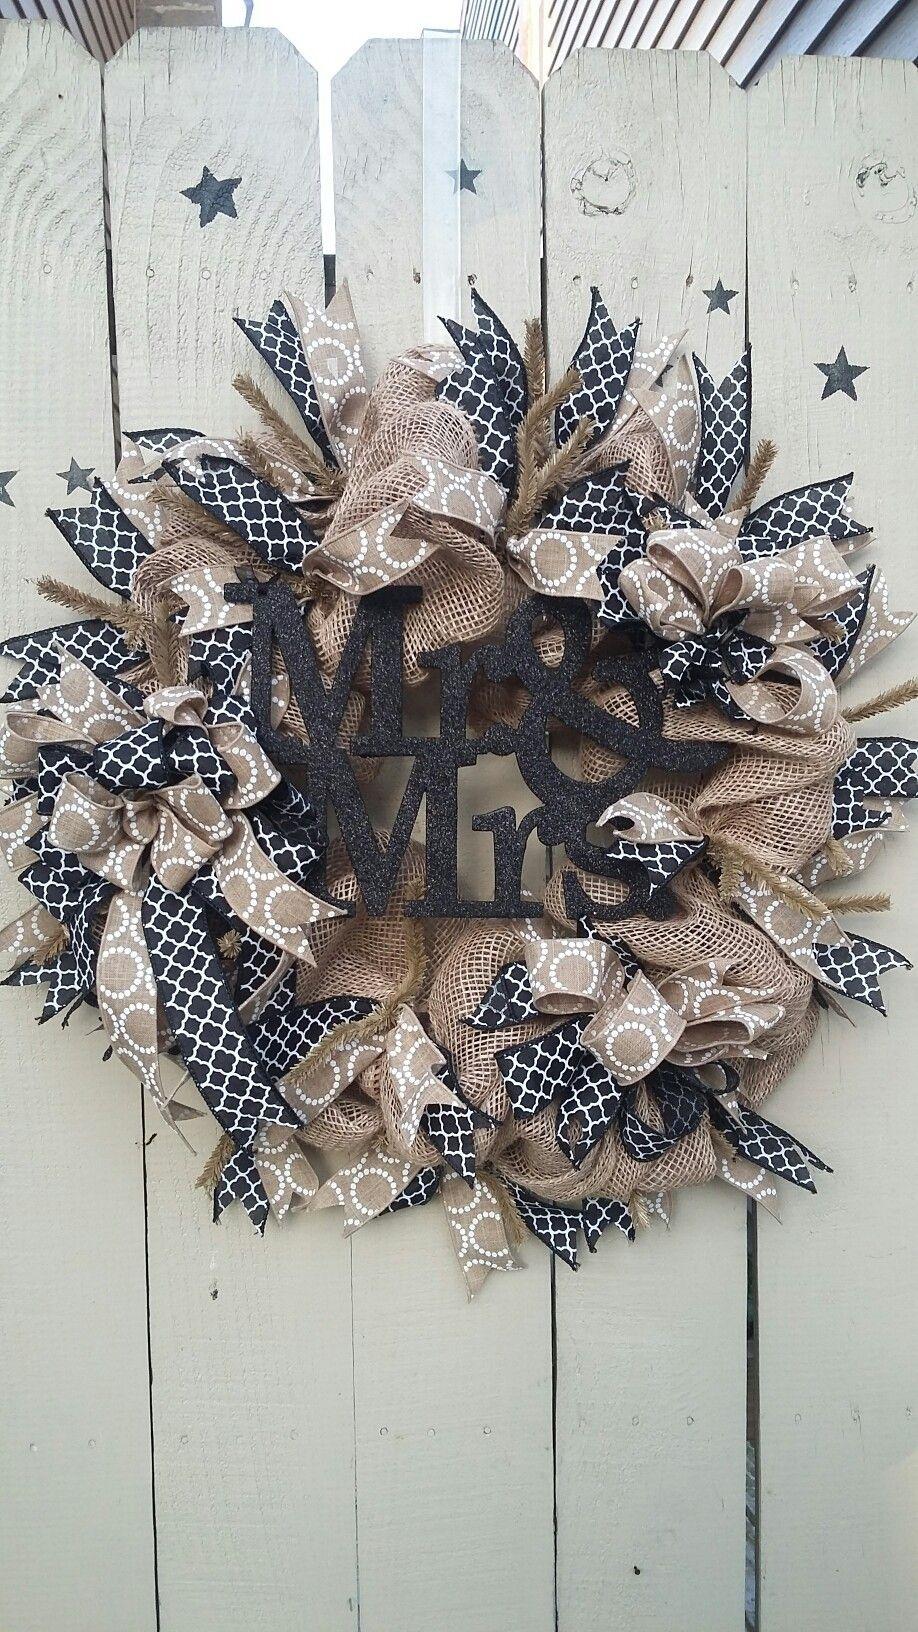 Wedding wreath mesh. Mr & mrs tan and black  www.facebook.com/cumberlandwreaths